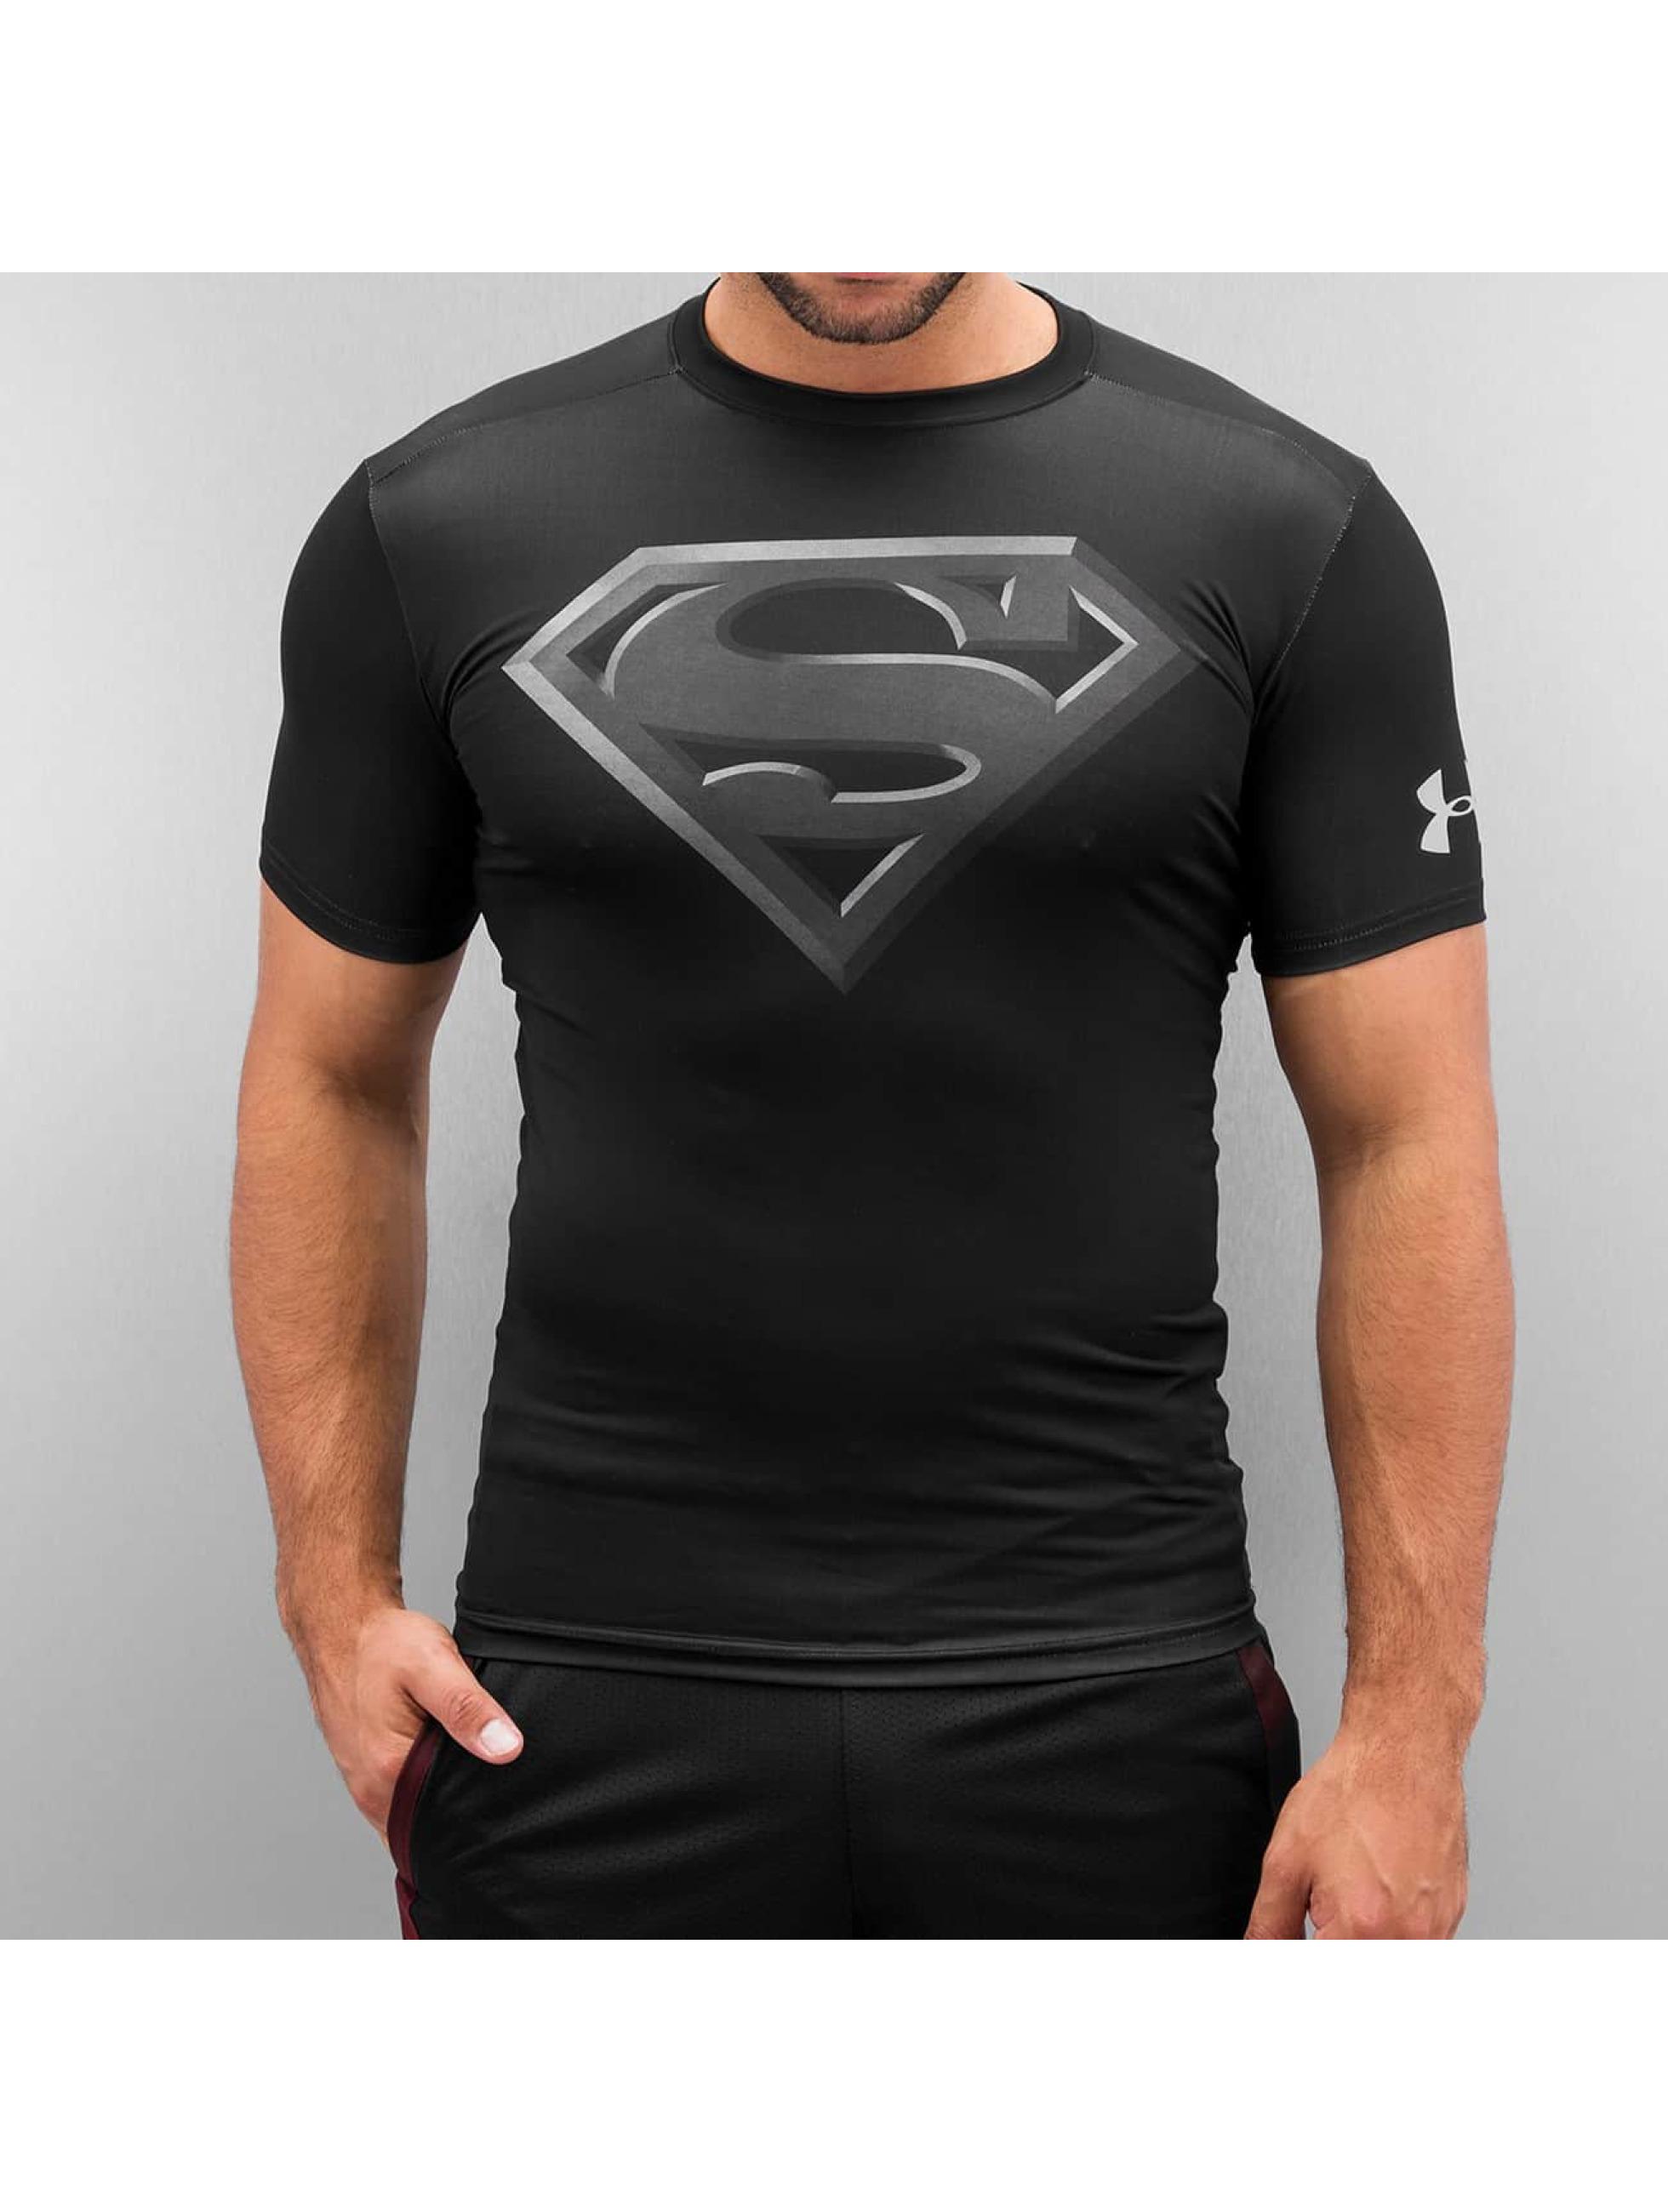 T-Shirt Under Armour Alter Ego Superman Compression en noir